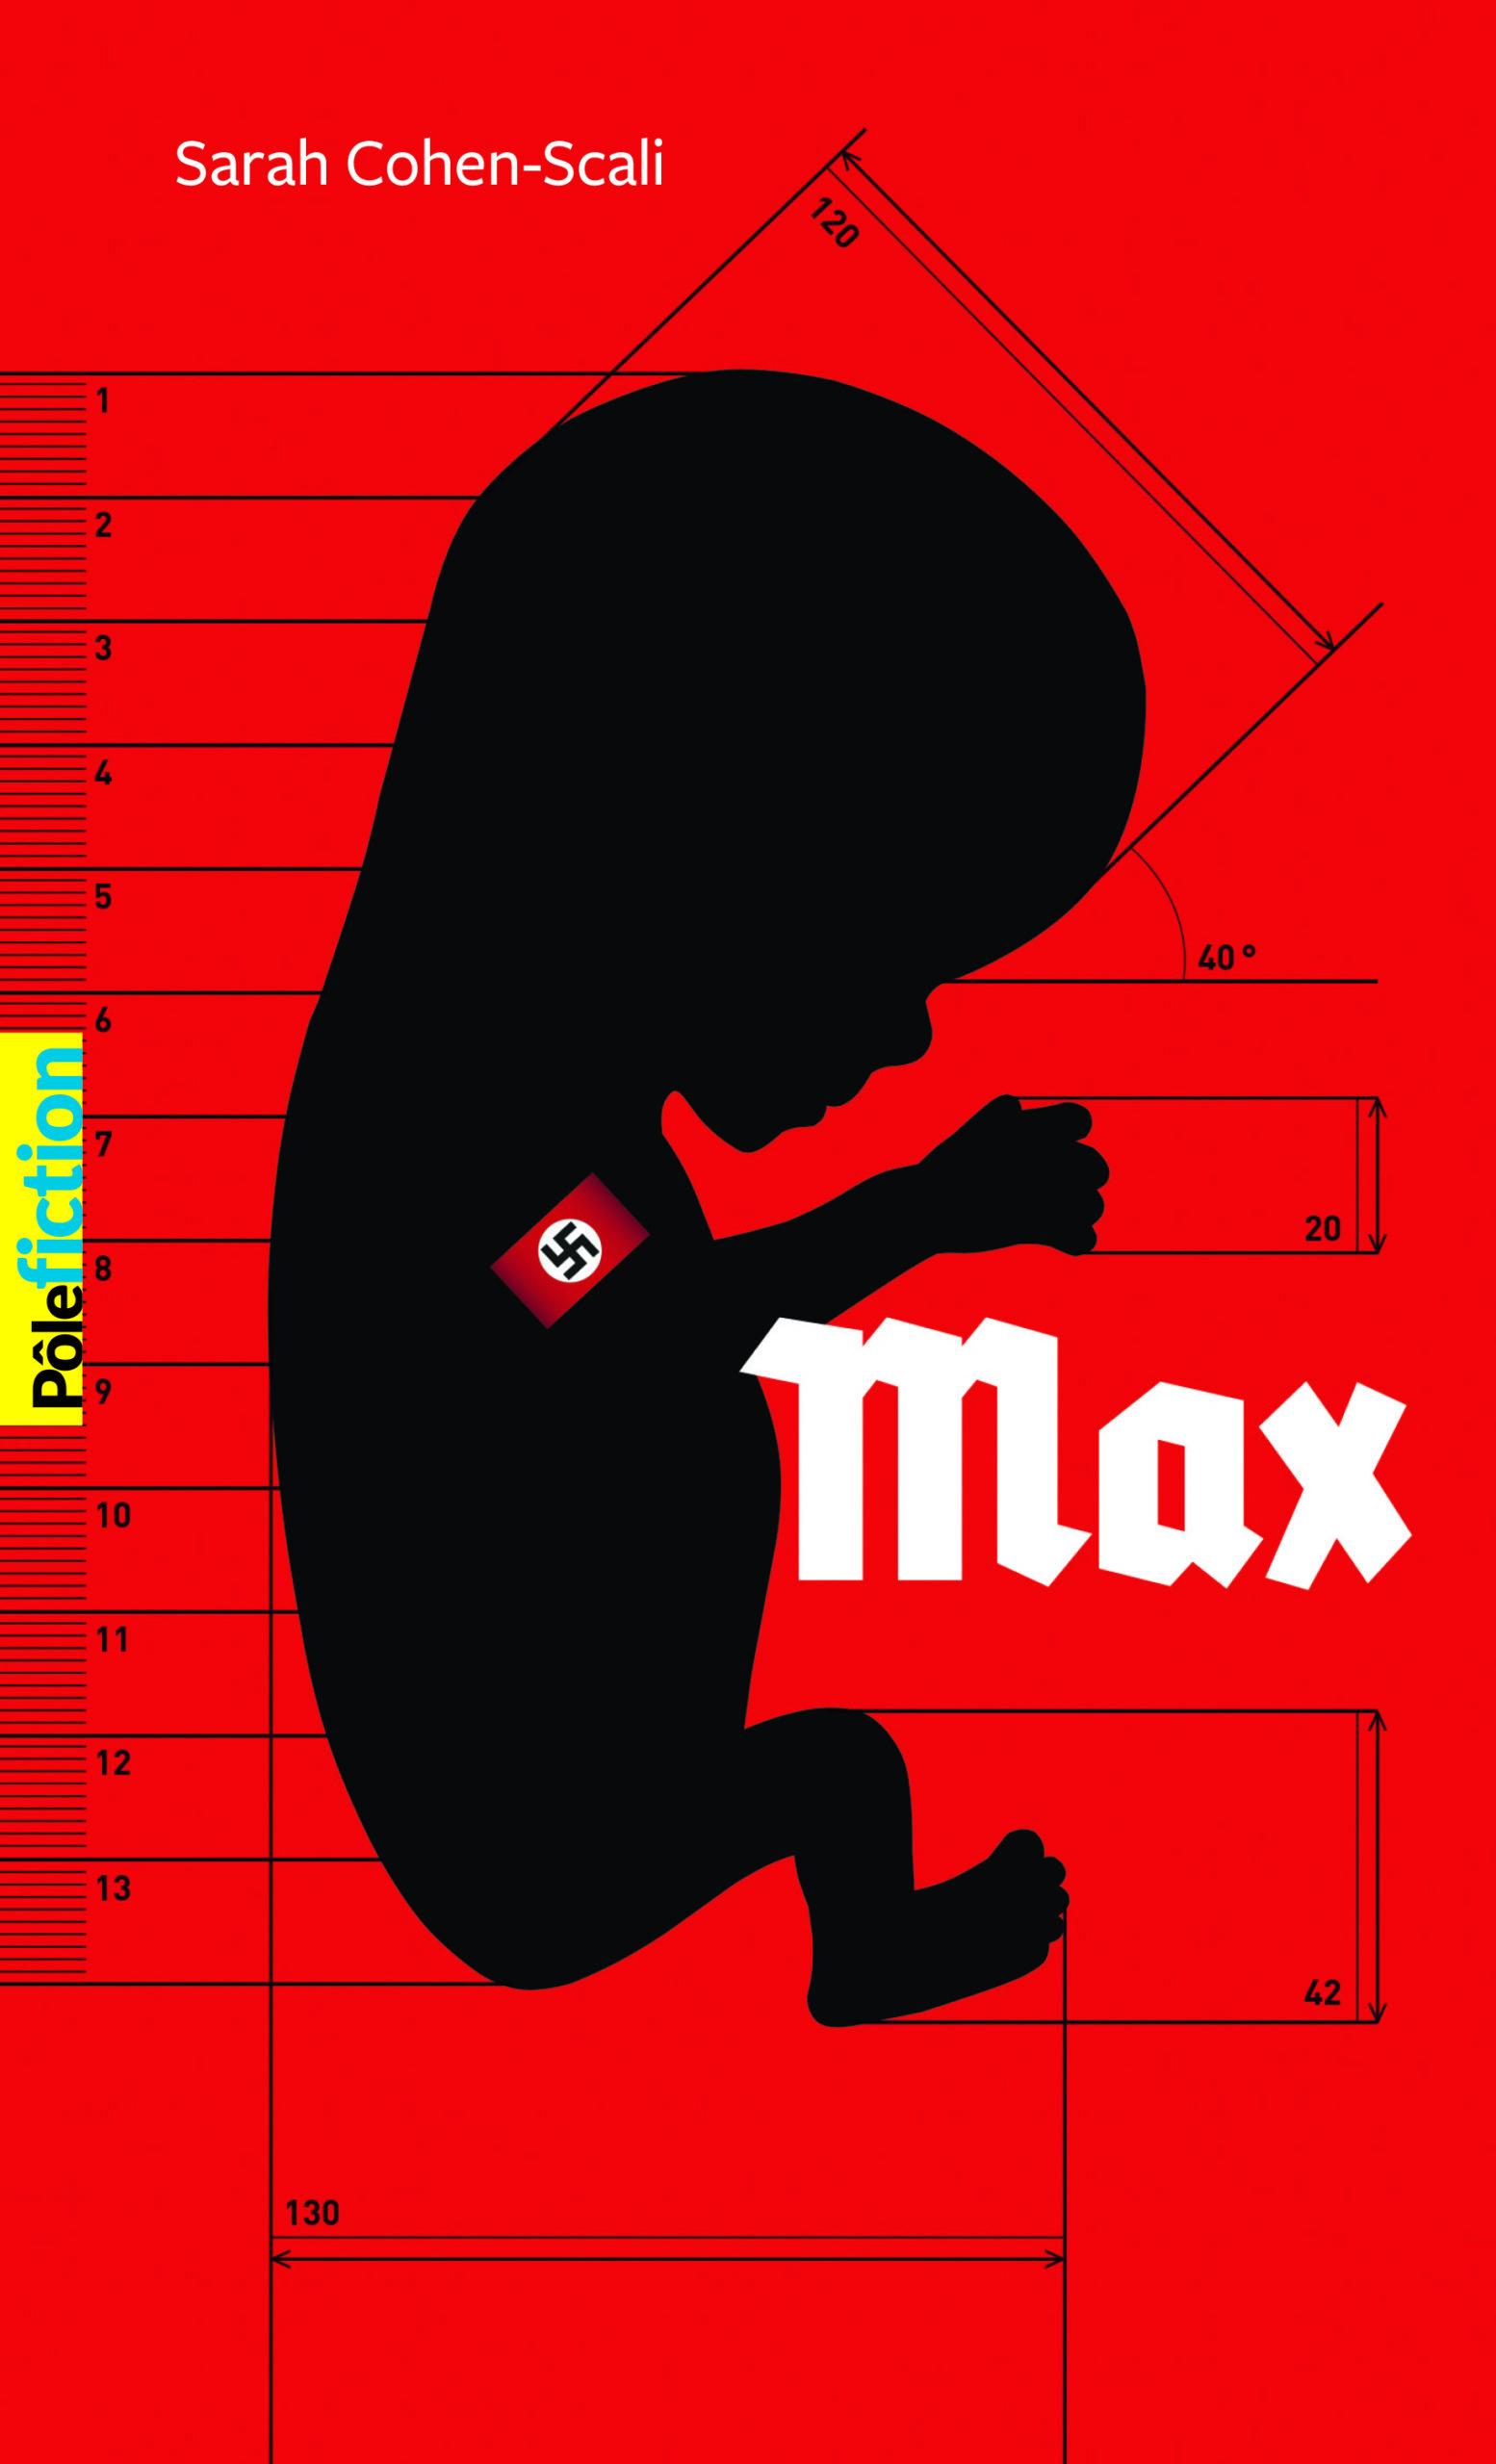 image de http://revueloiseaubleu.fr/wp-content/uploads/2021/03/Max-Gallimard--scaled.jpeg